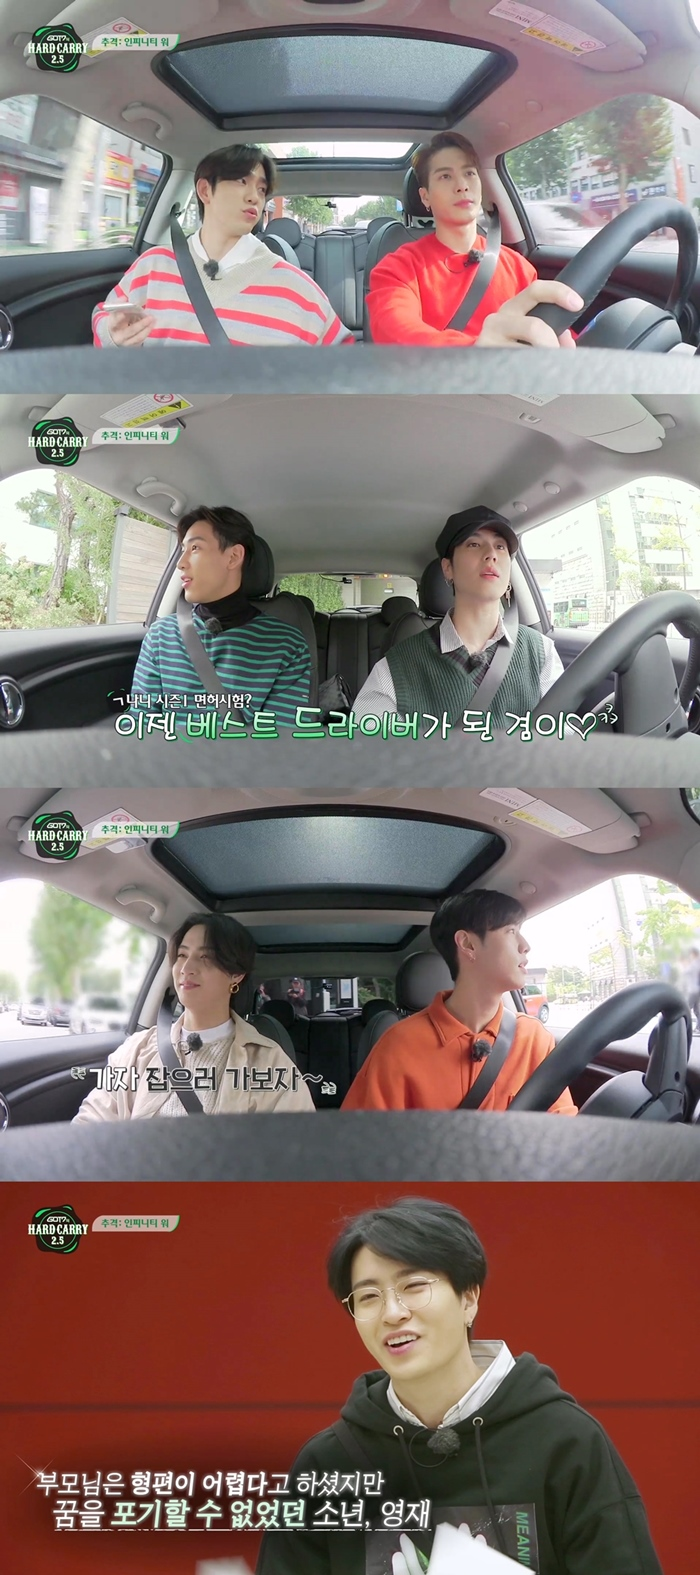 Mnet M2推出的《GOT7的HARD CARRY 2.5》再次回归